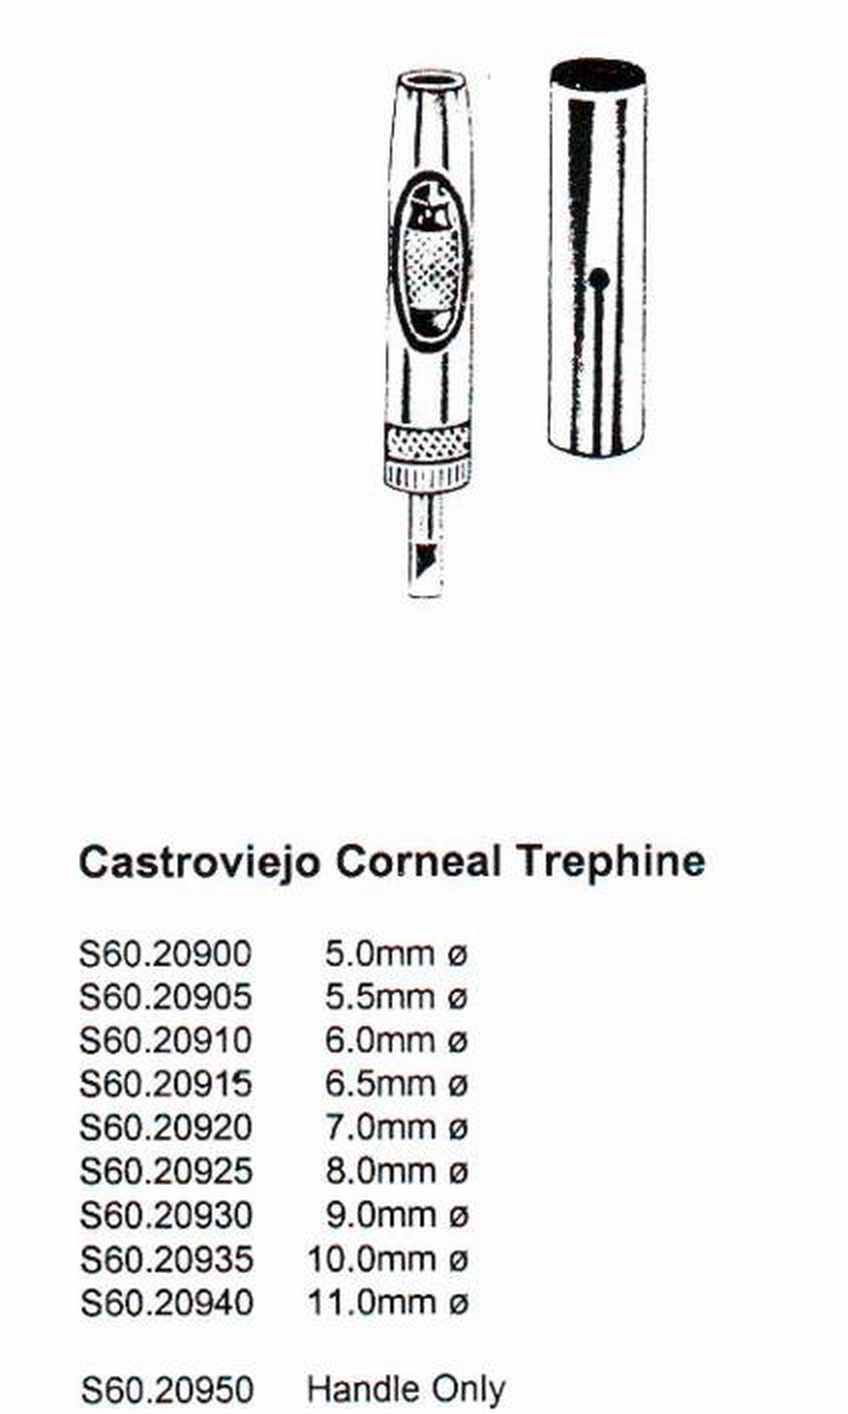 Ophthalmic Trephine CASTROVIEJO COR...